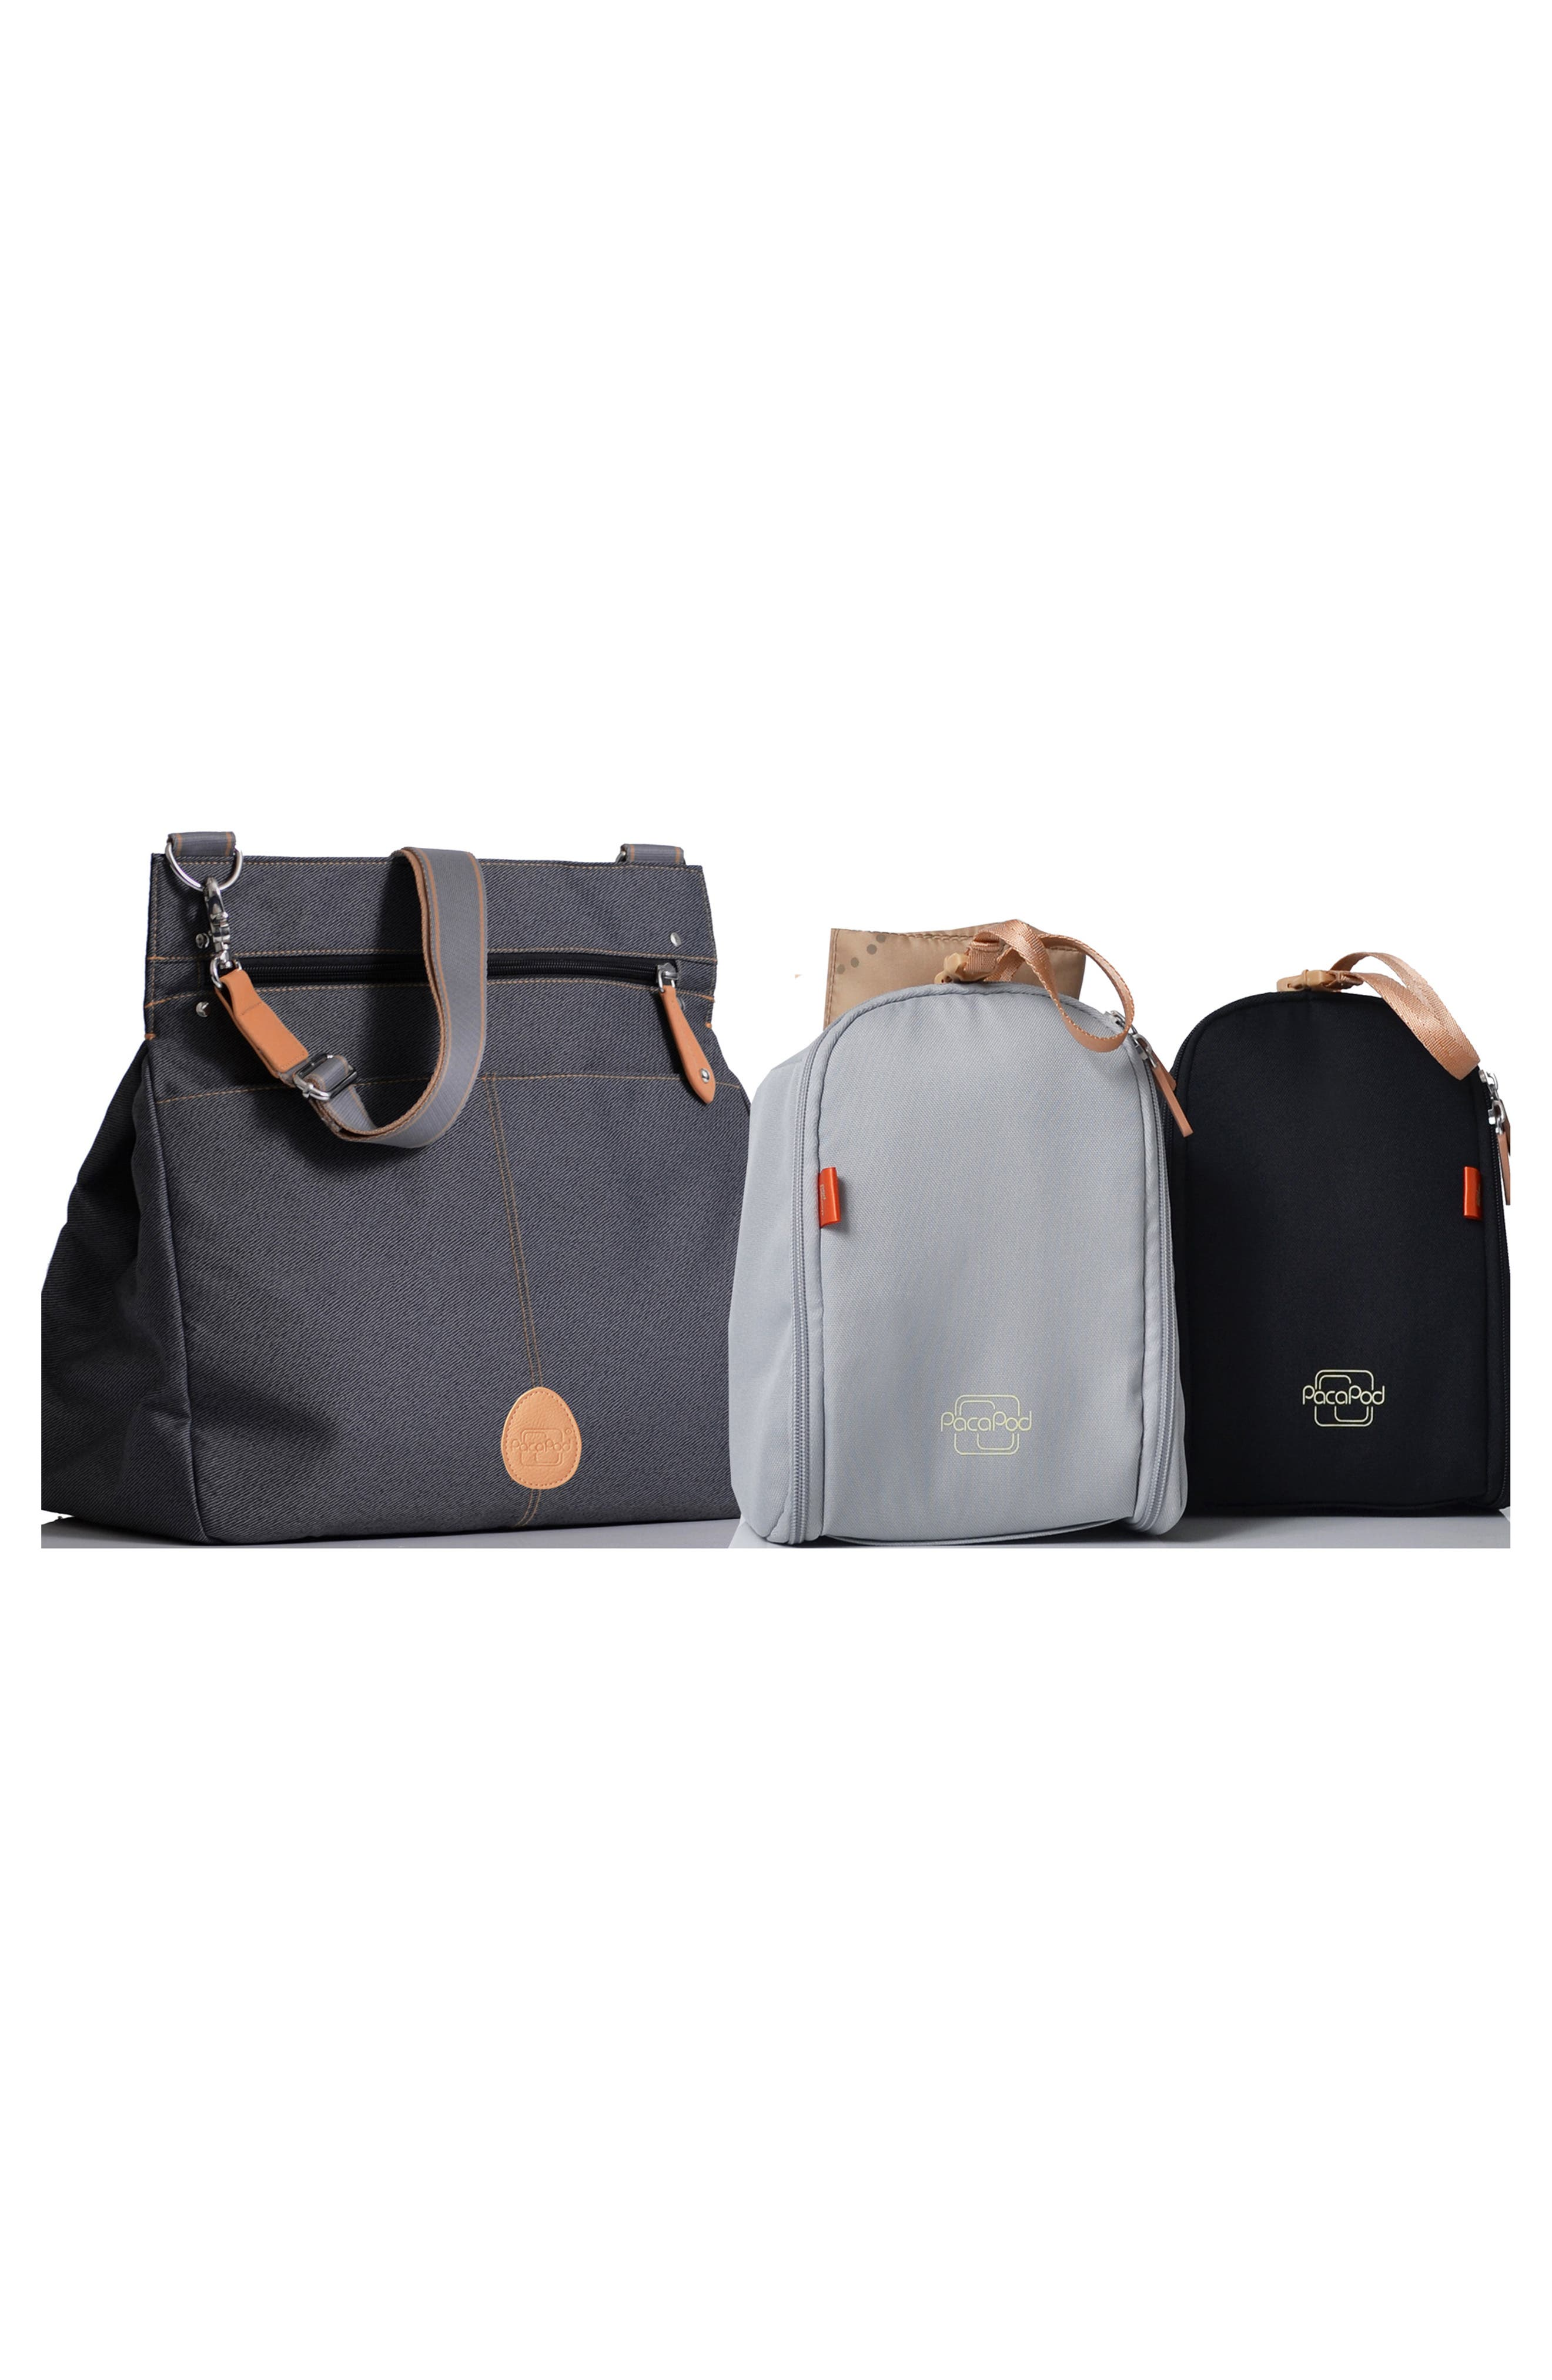 'Oban' Diaper Bag,                             Alternate thumbnail 4, color,                             BLACK CHARCOAL